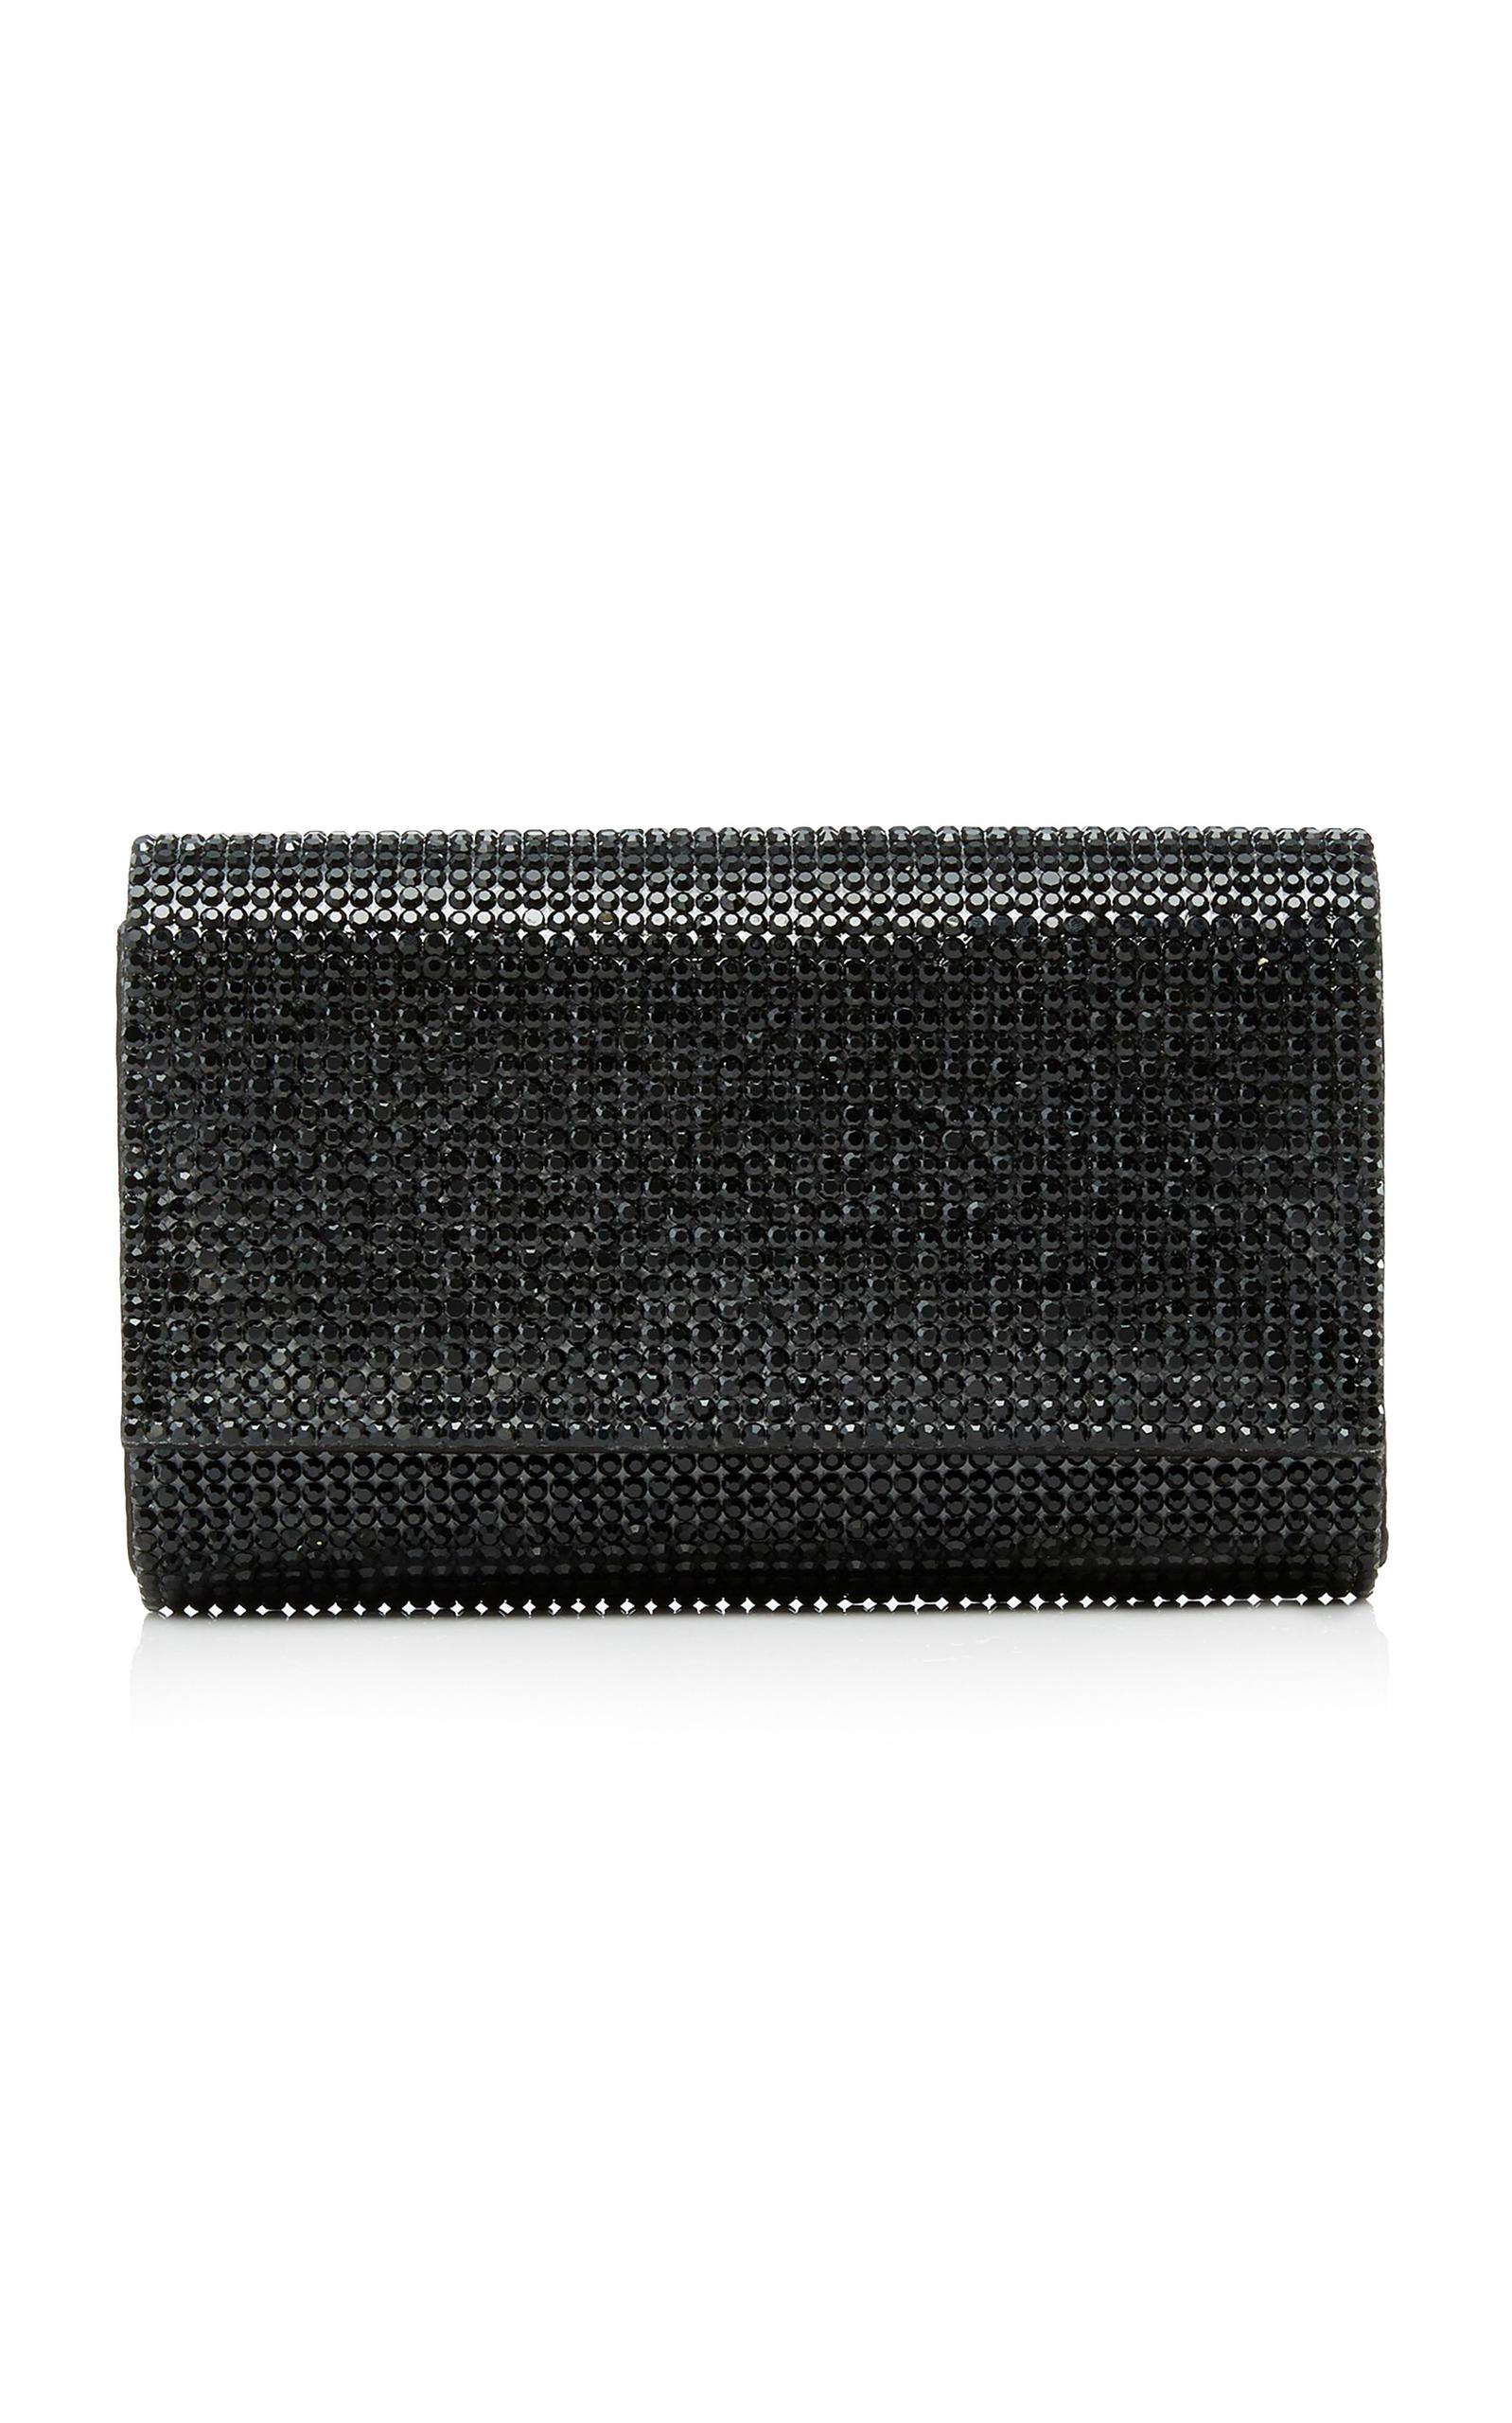 47db1c8e33304 Judith Leiber Fizzy Crystal-Embellished Clutch In Black